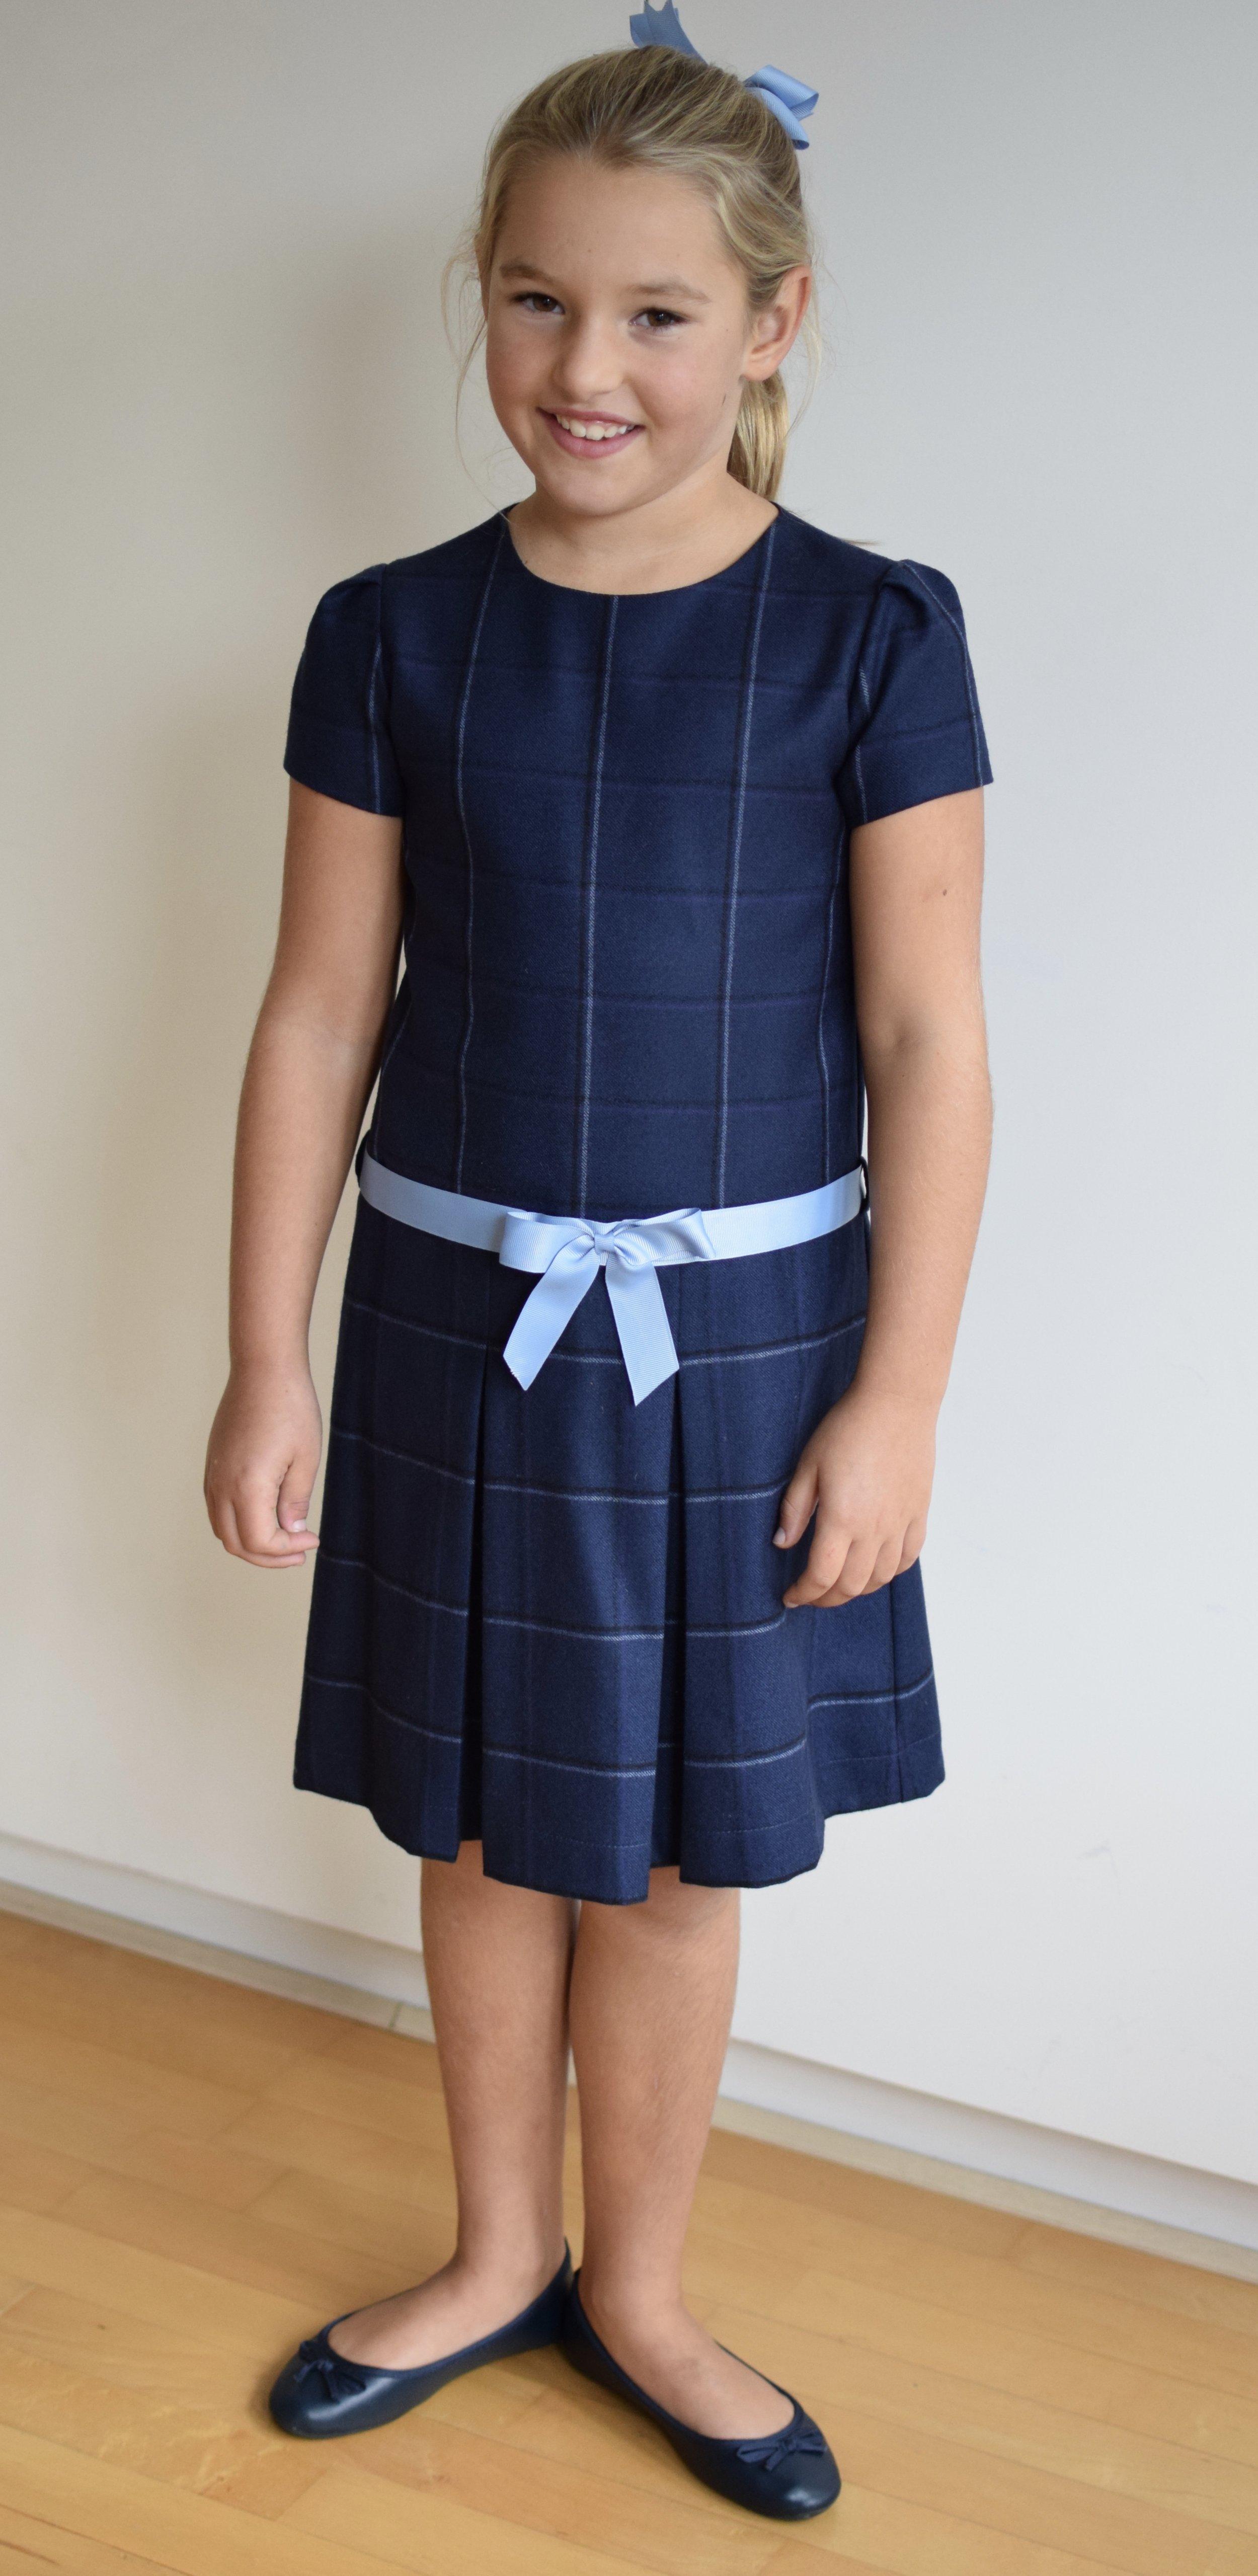 AW16 Wool dress